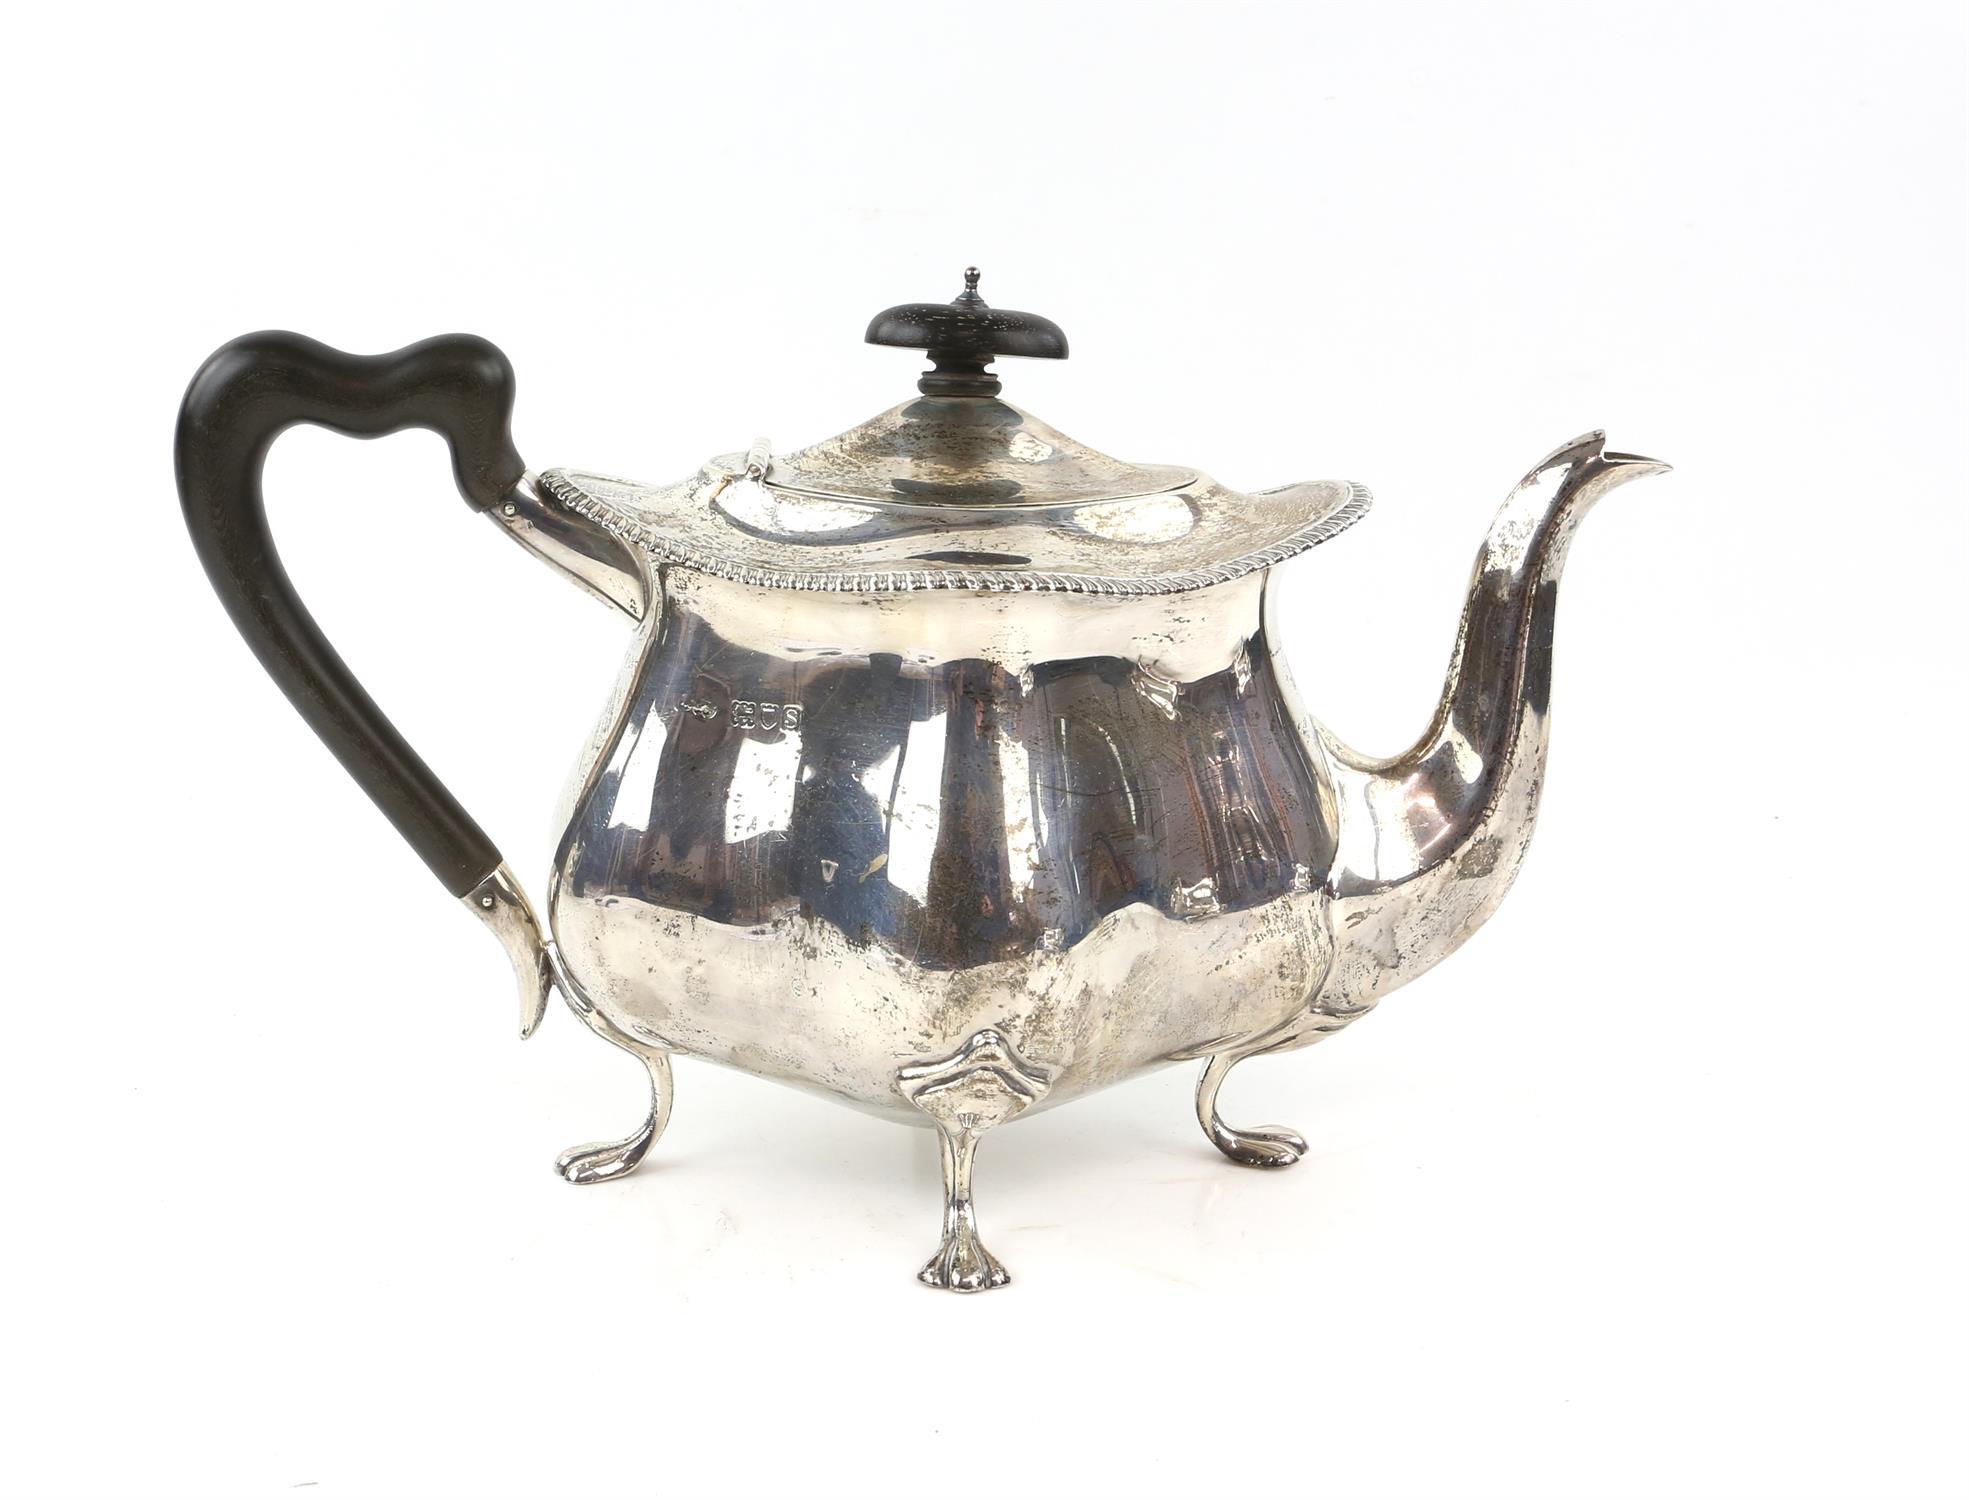 Four piece silver tea and coffee service of fluted diamond shape comprising Coffee Pot, Tea Pot, - Image 2 of 10